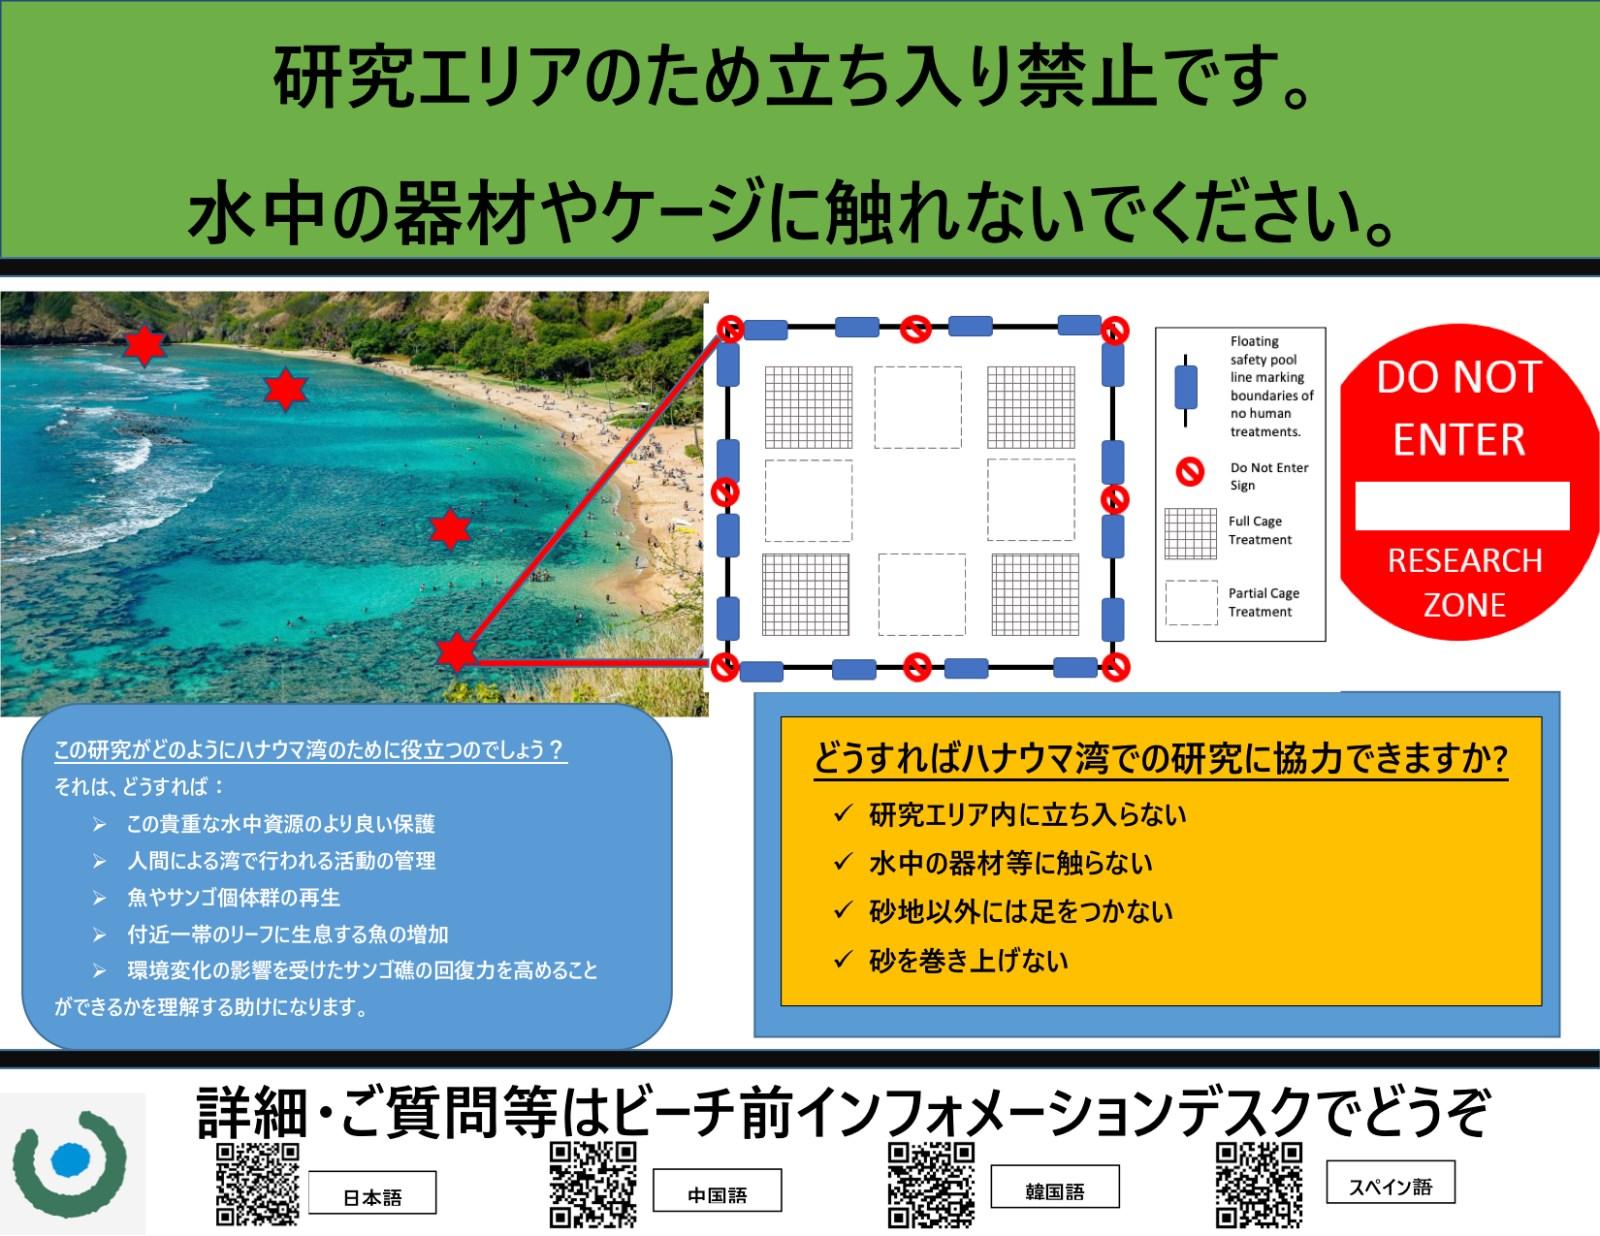 IMPACT STUDY SIGN Japanese (1).jpg